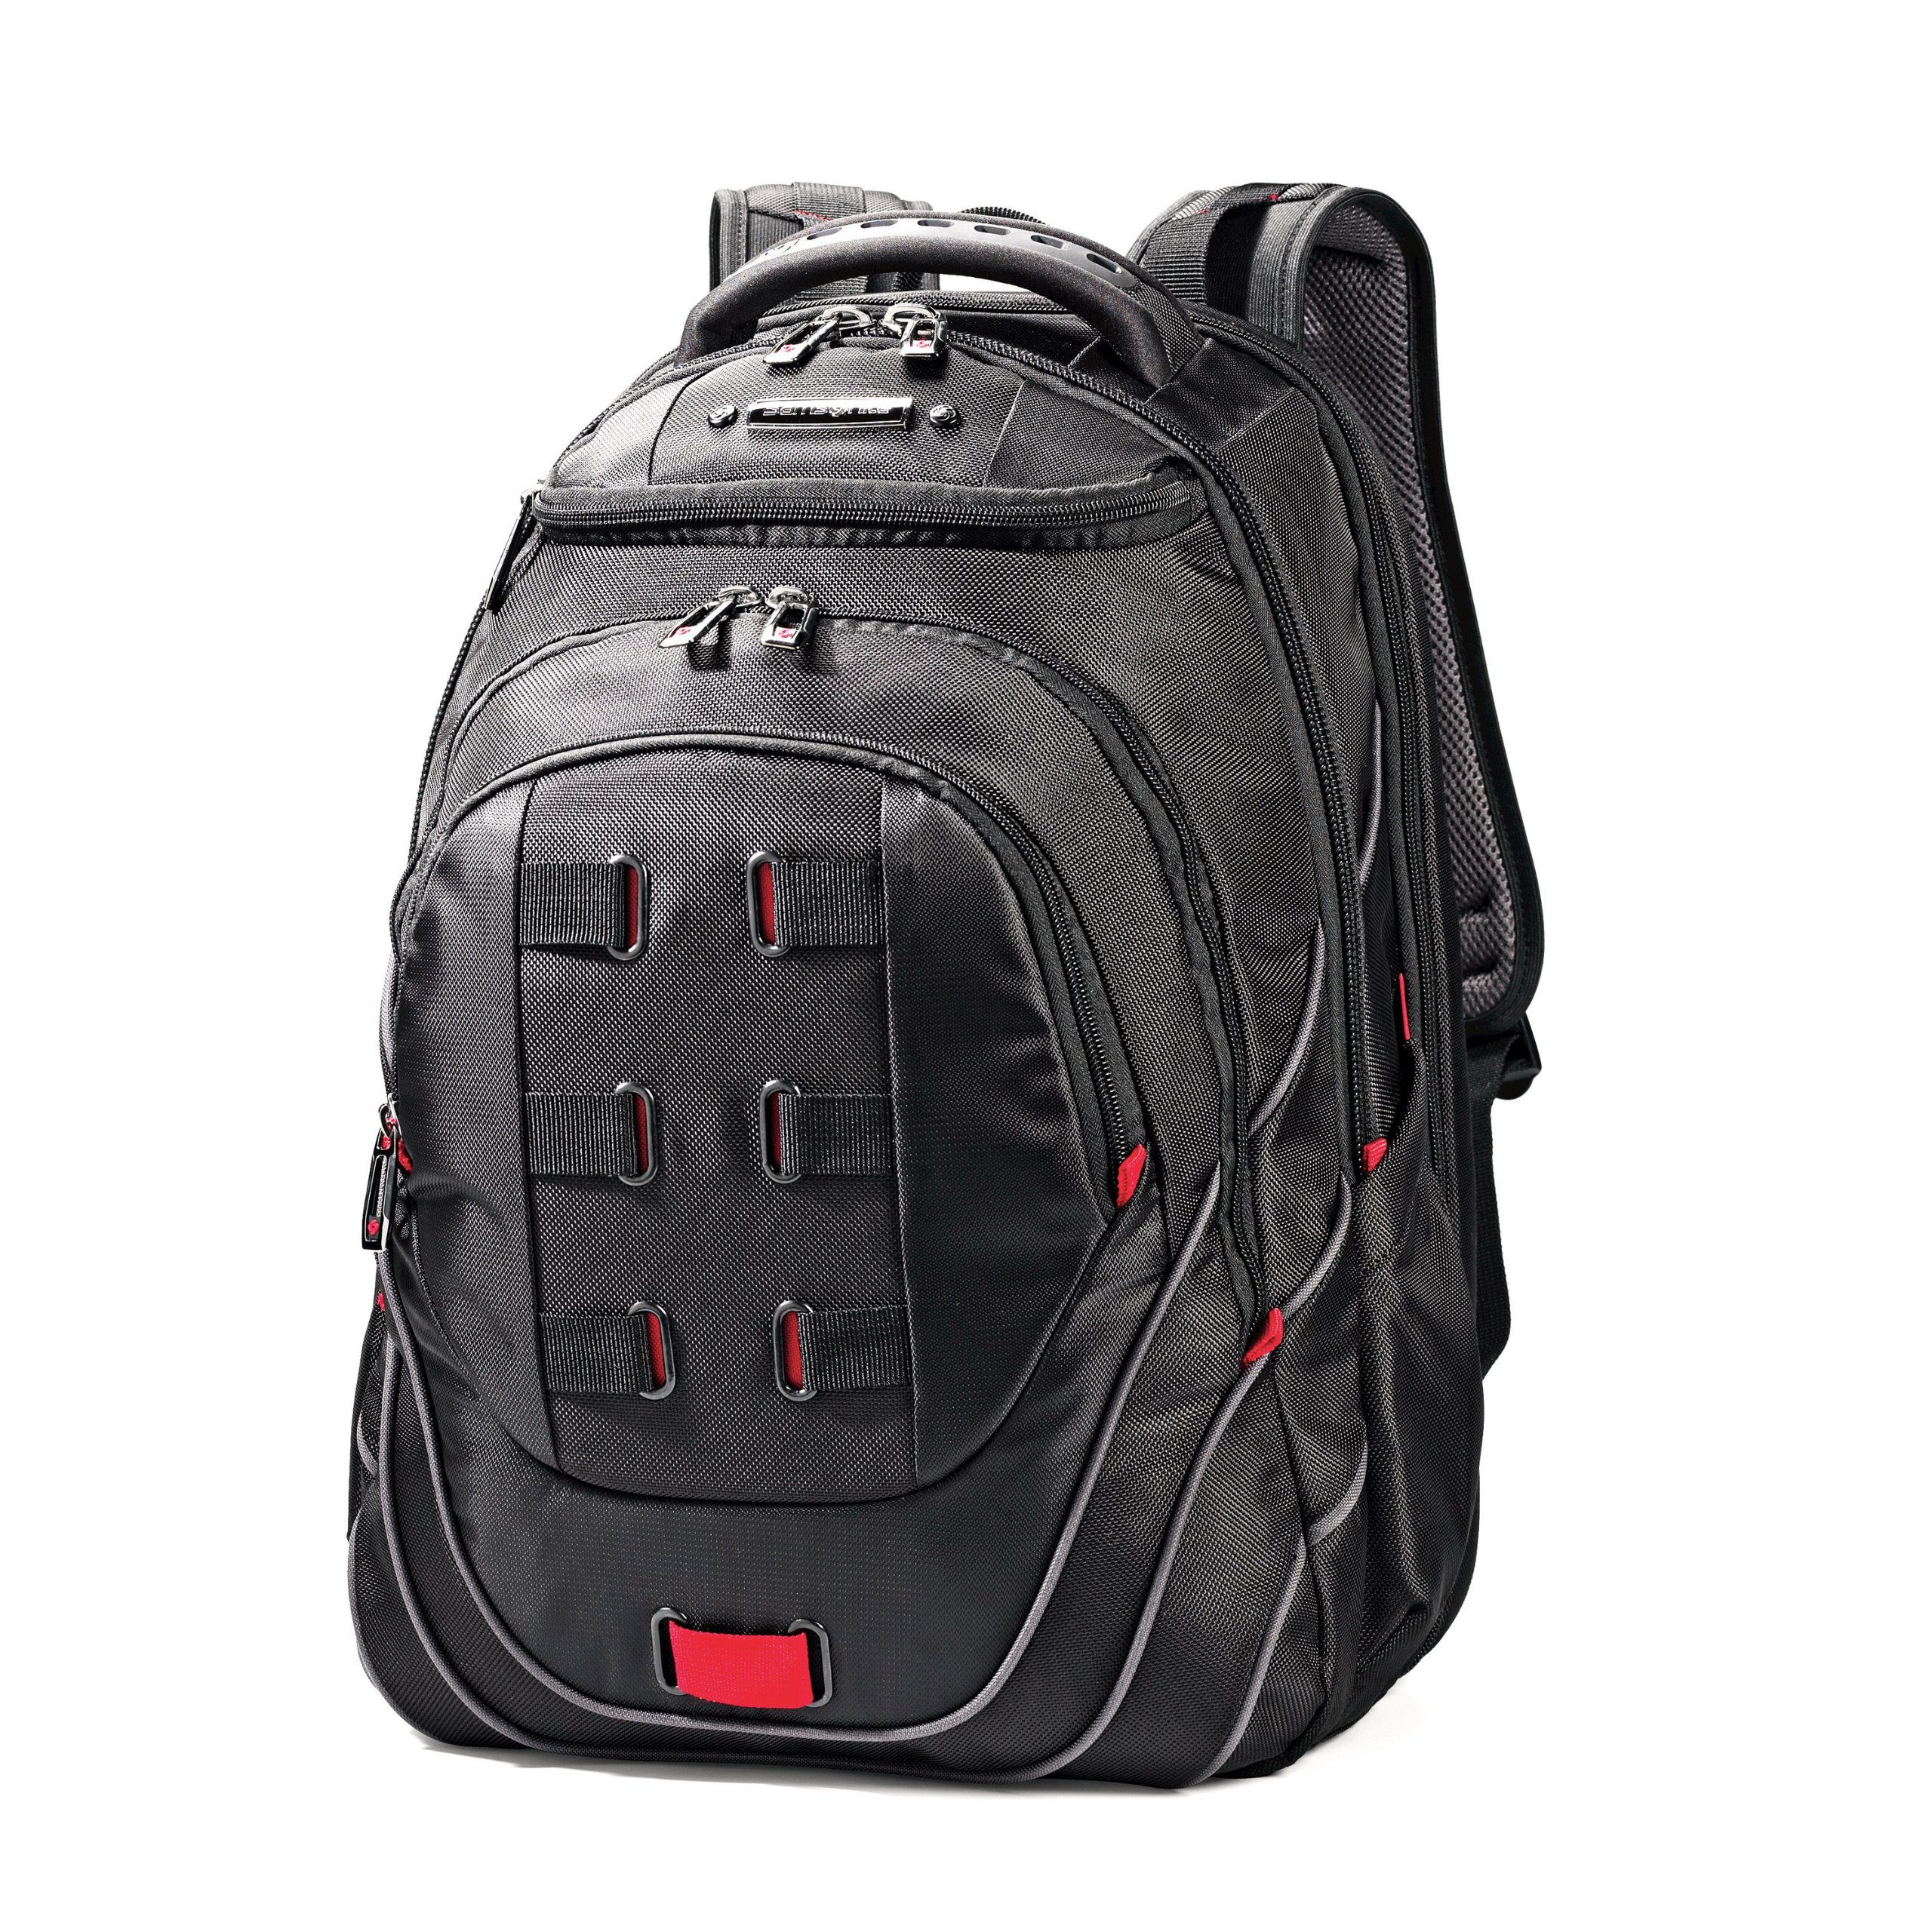 Samsonite Luggage Tectonic Backpack, Black/Red